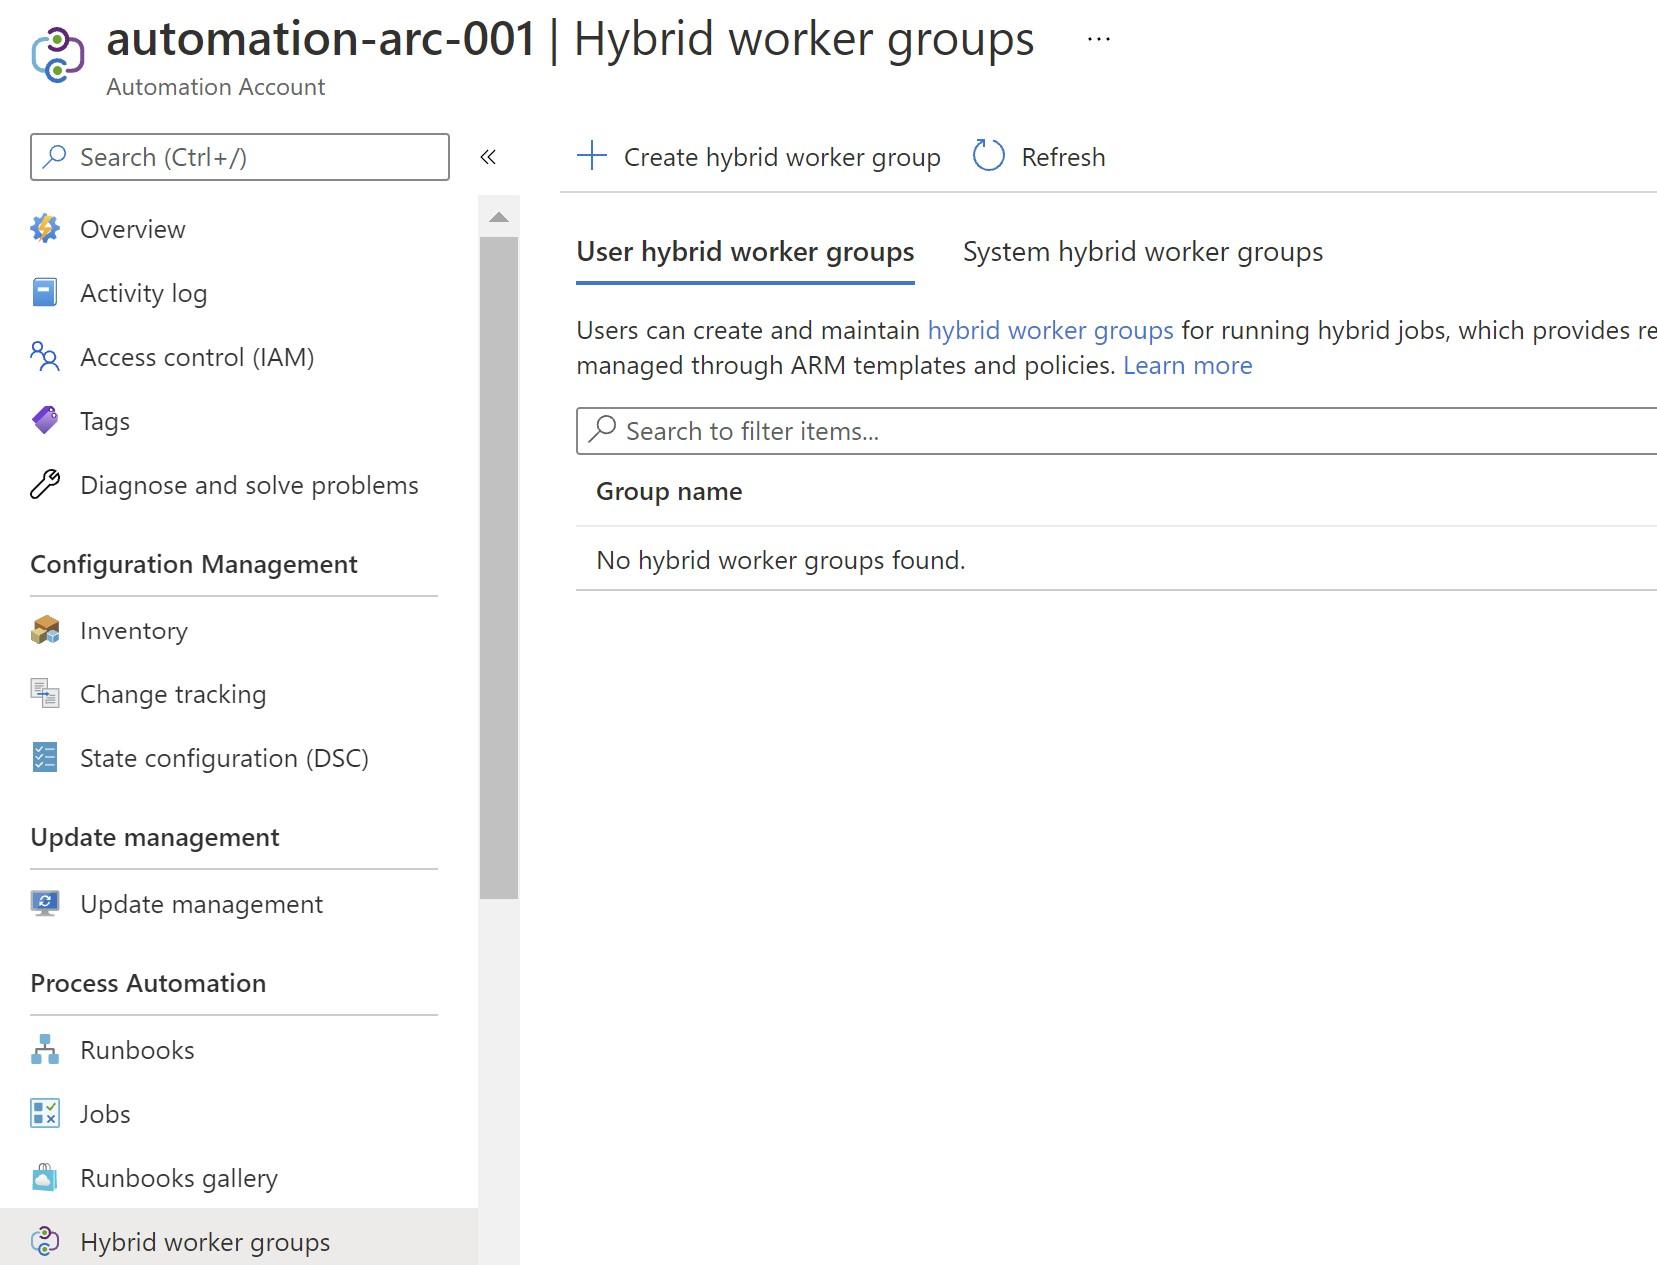 New hybrid worker